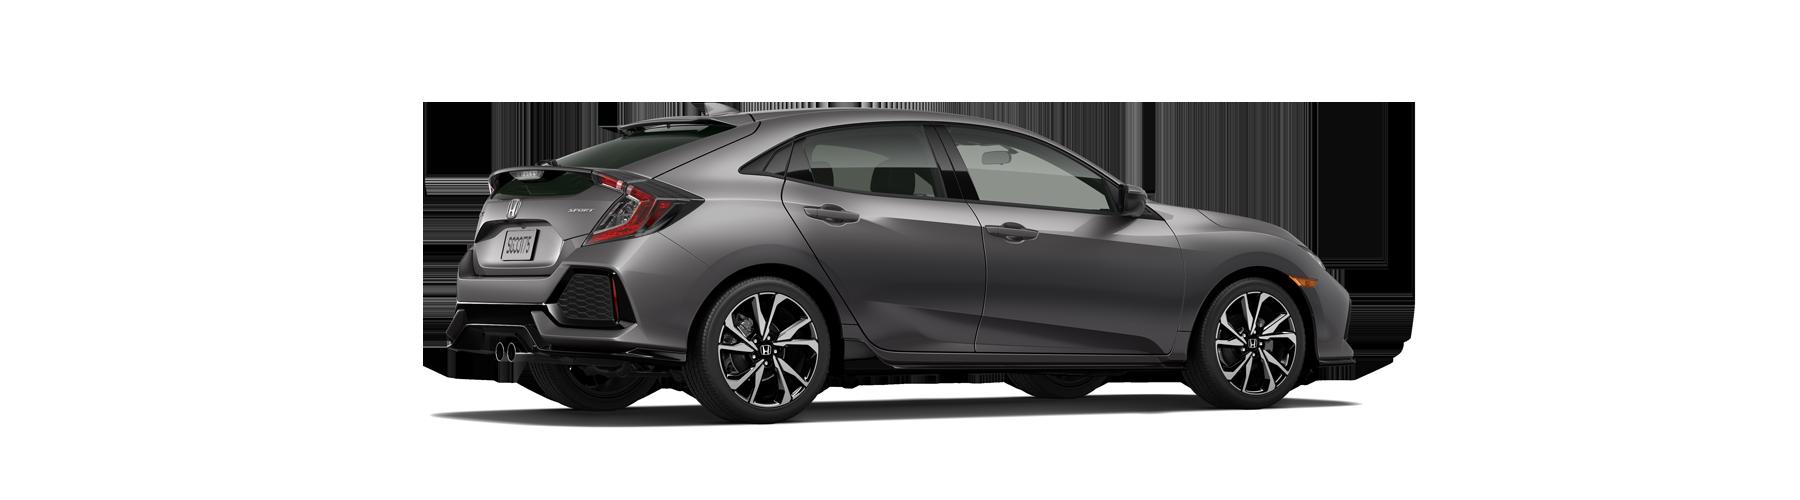 2017 Honda Civic Hatchback New England Honda Dealers